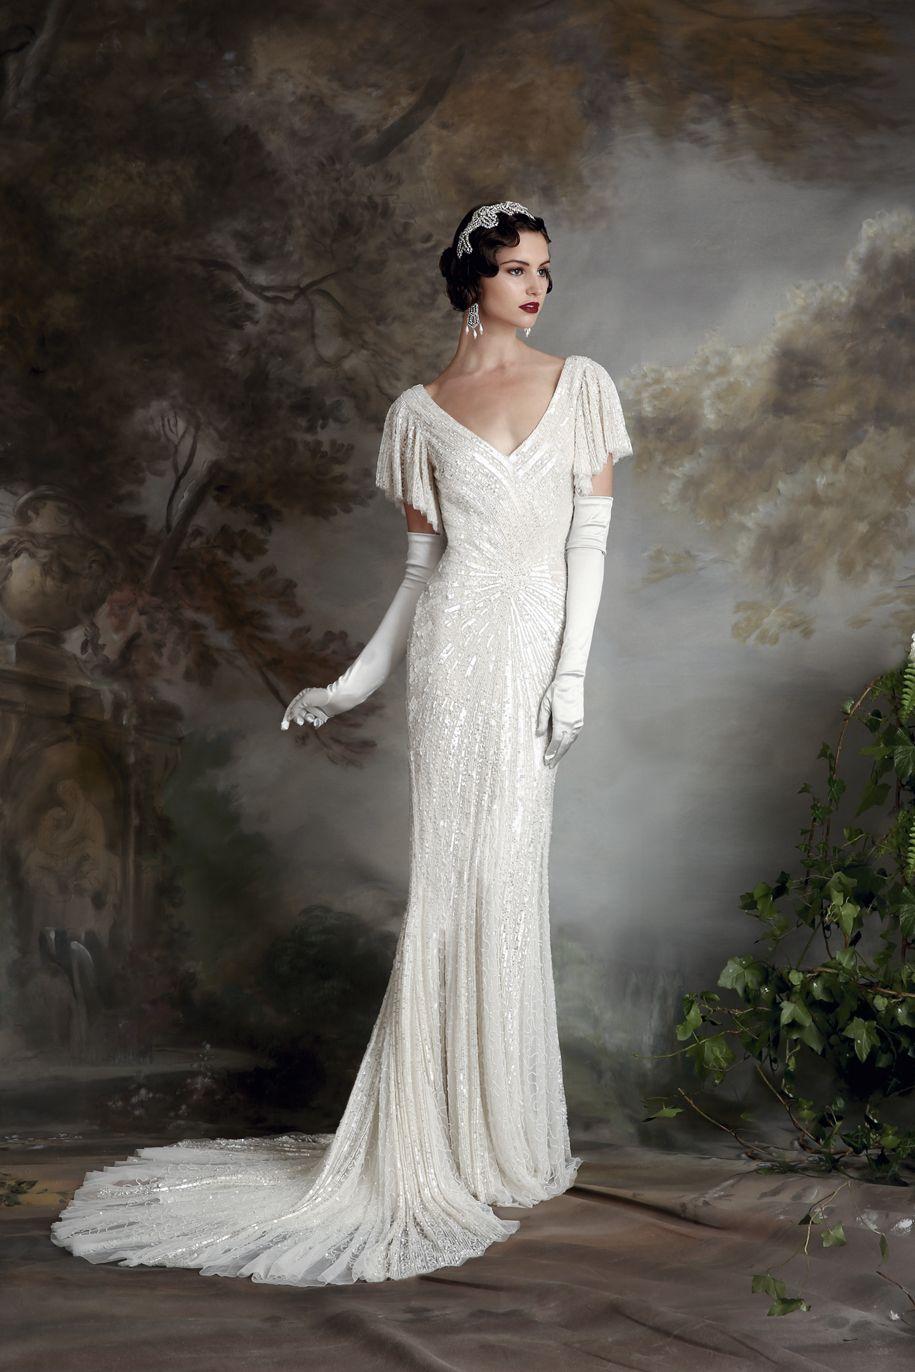 Vintage wedding dress 20s, Art deco wedding dress, Deco wedding ...